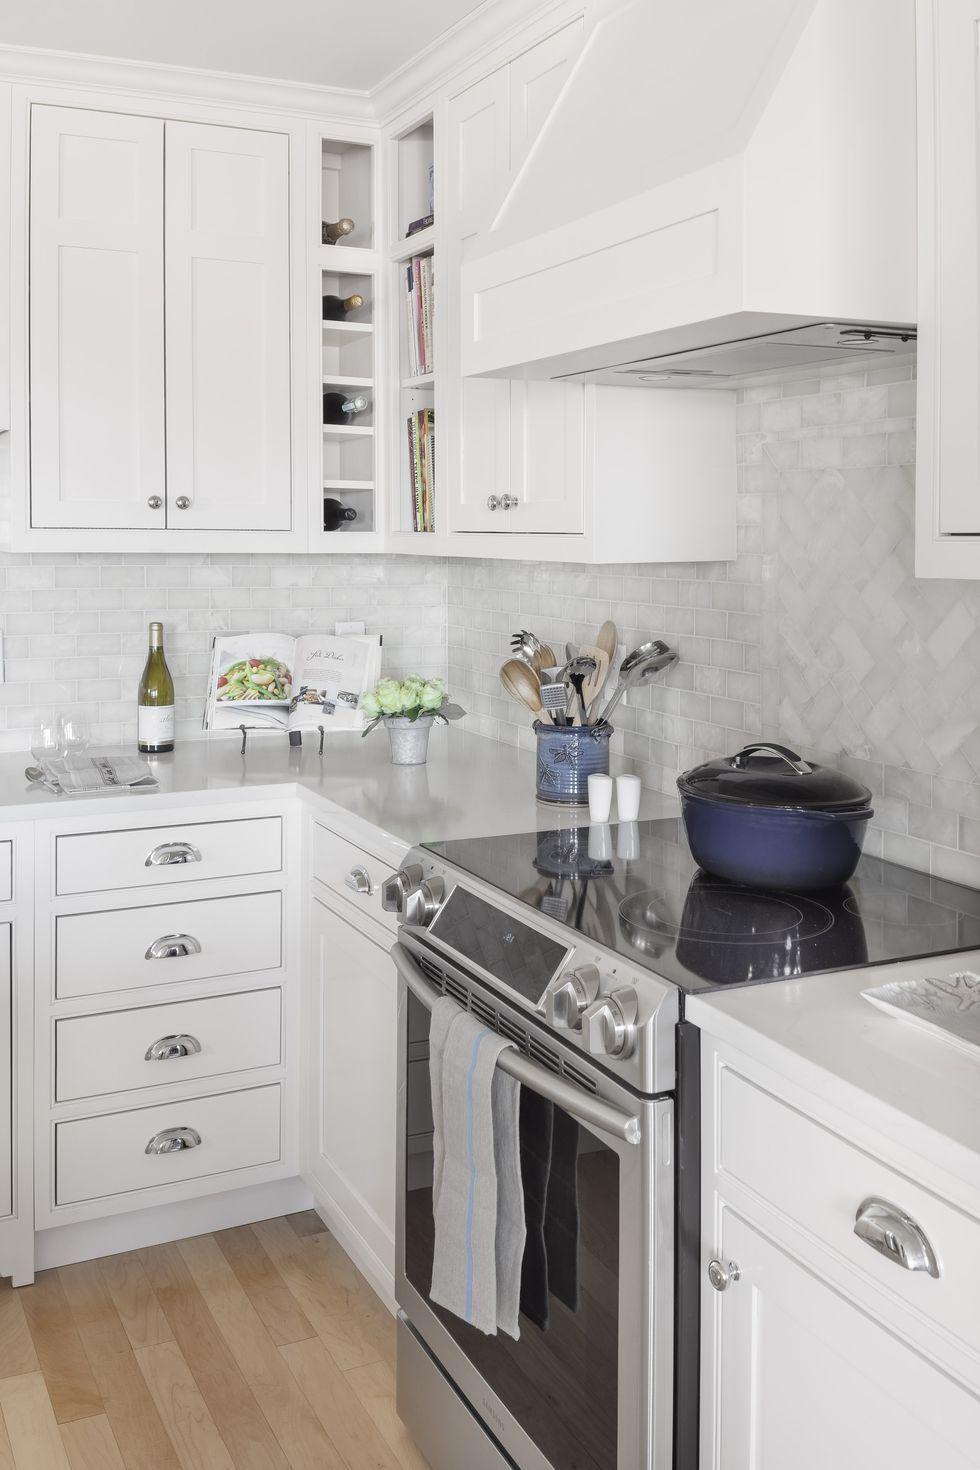 51 Kitchen Tile Backsplash Ideas to Show Off Your Style ...